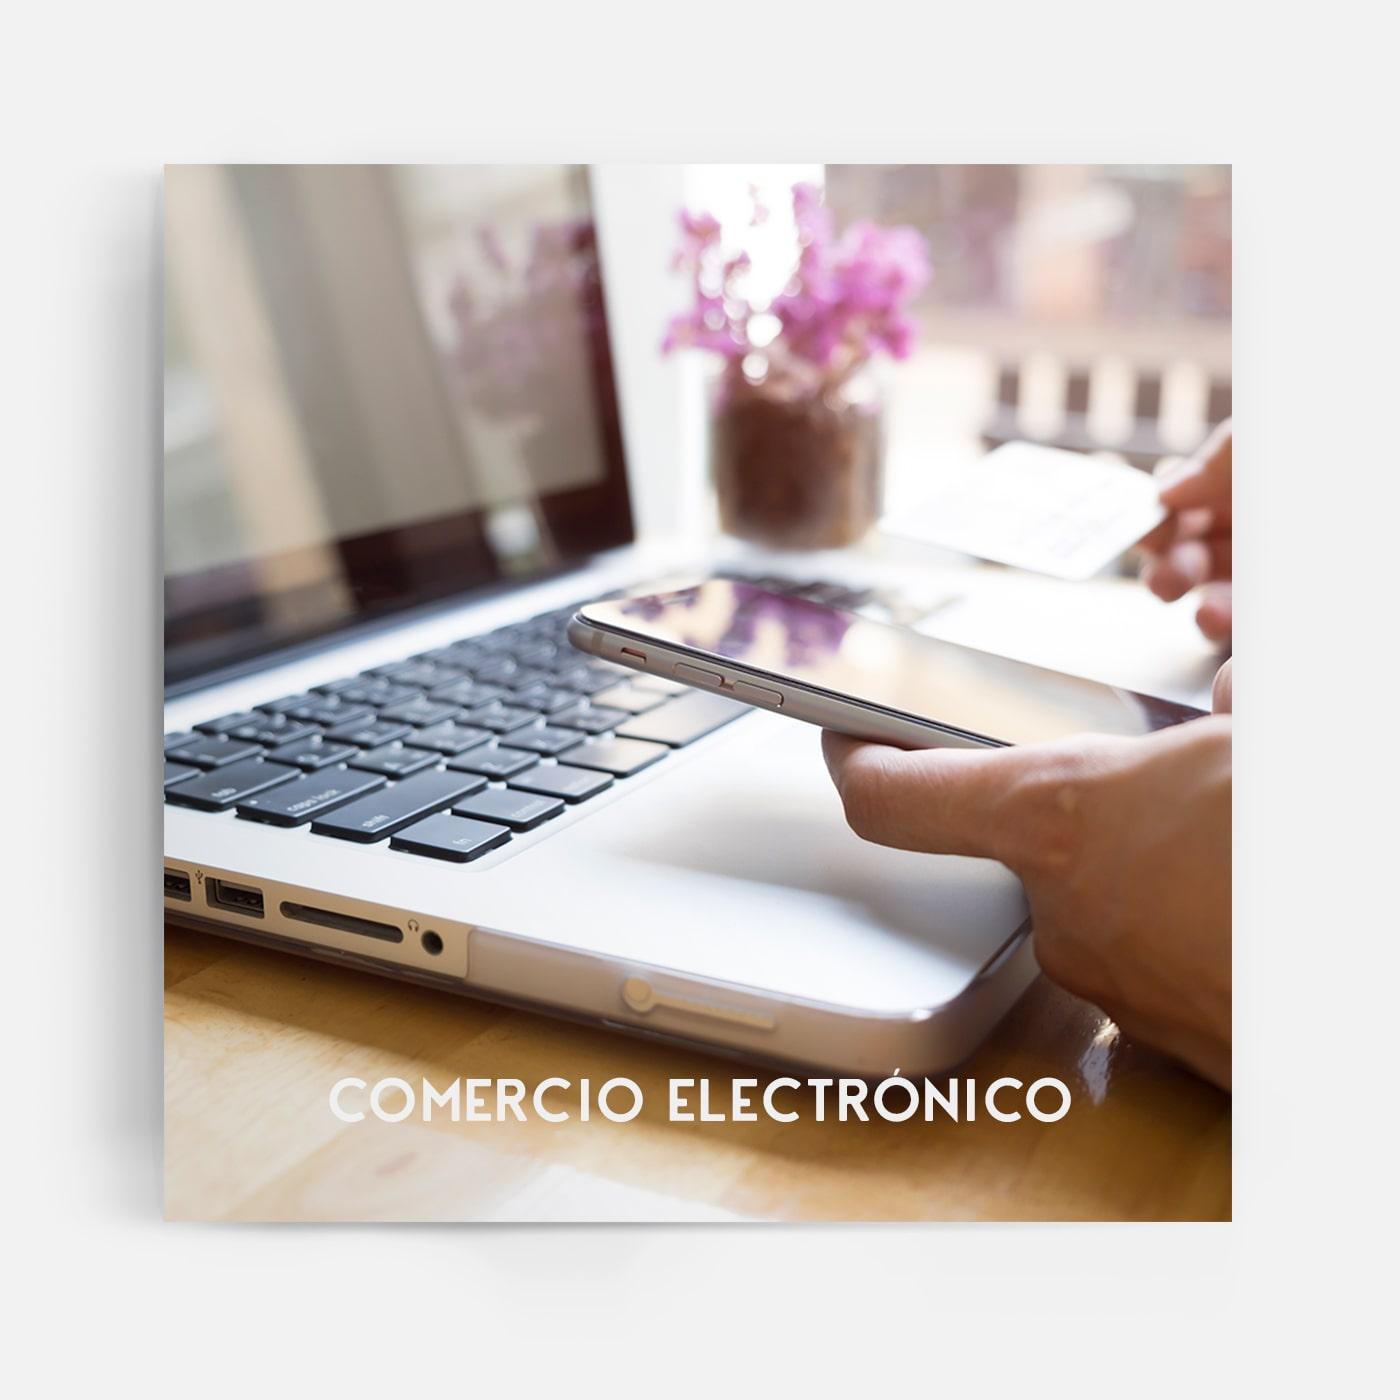 Comercio Electrónico E-commerce